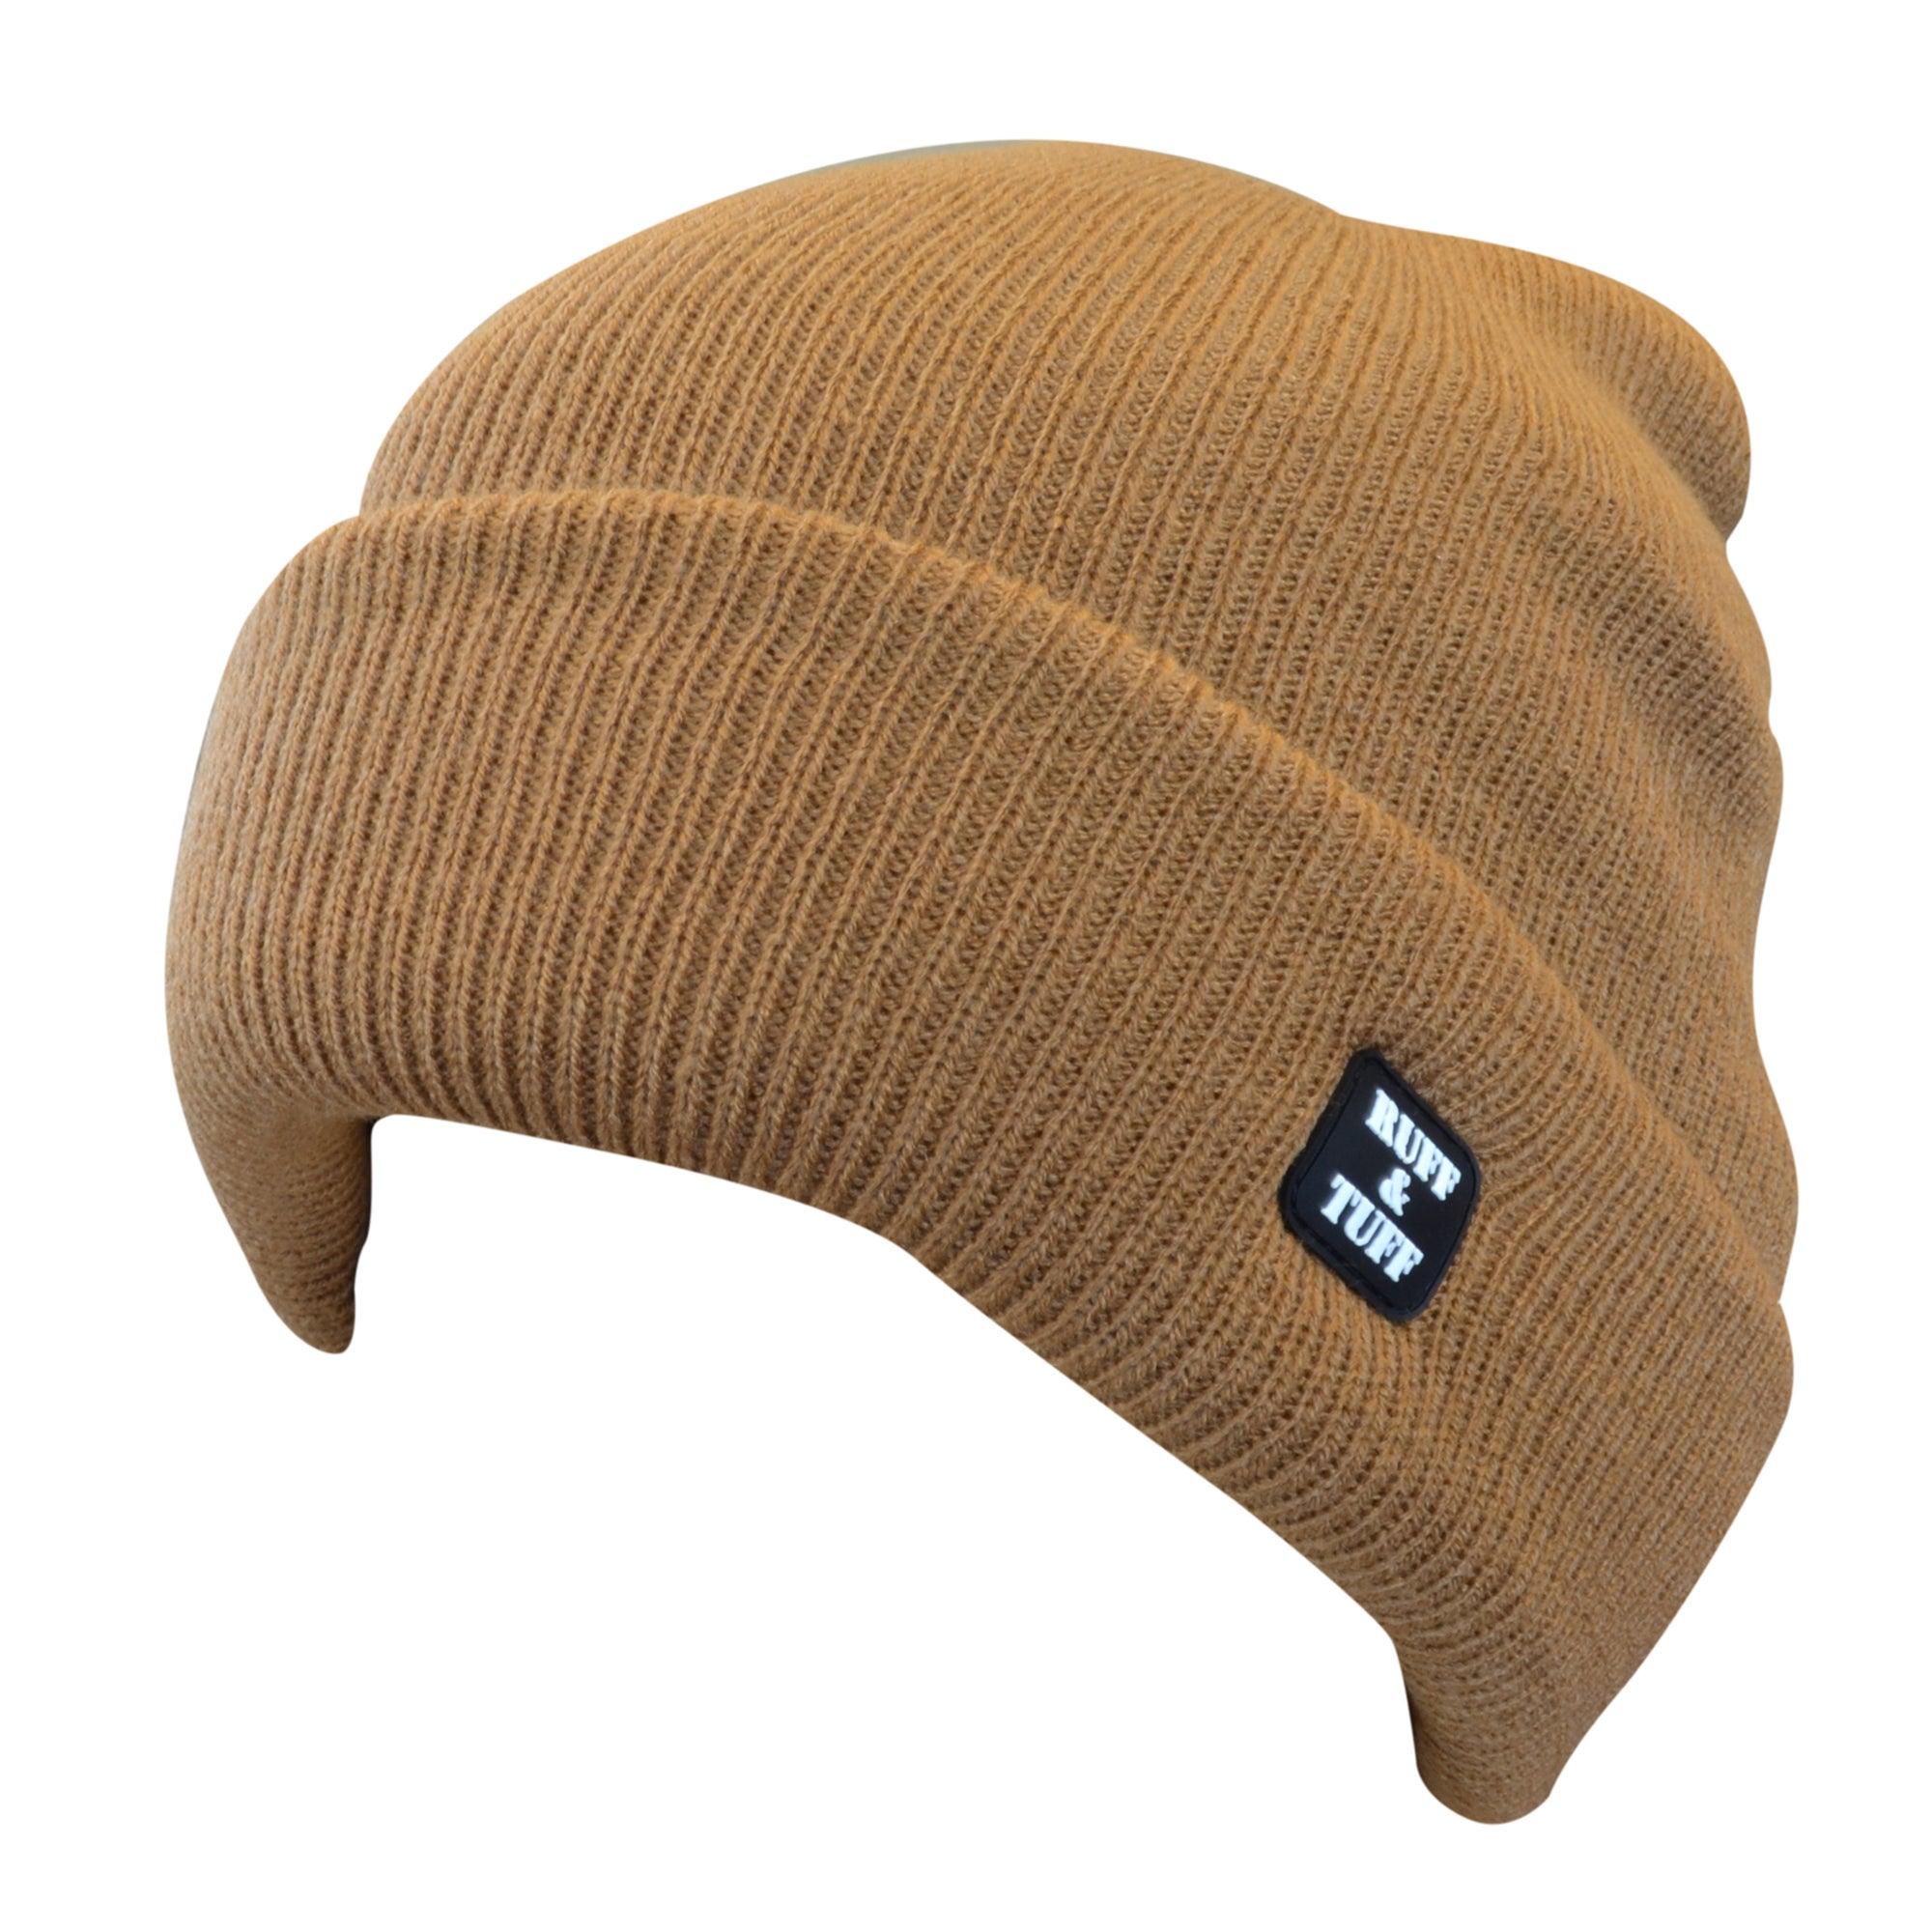 Quiet Wear Ruff & Tuff 4-layer Brown Cuff Cap